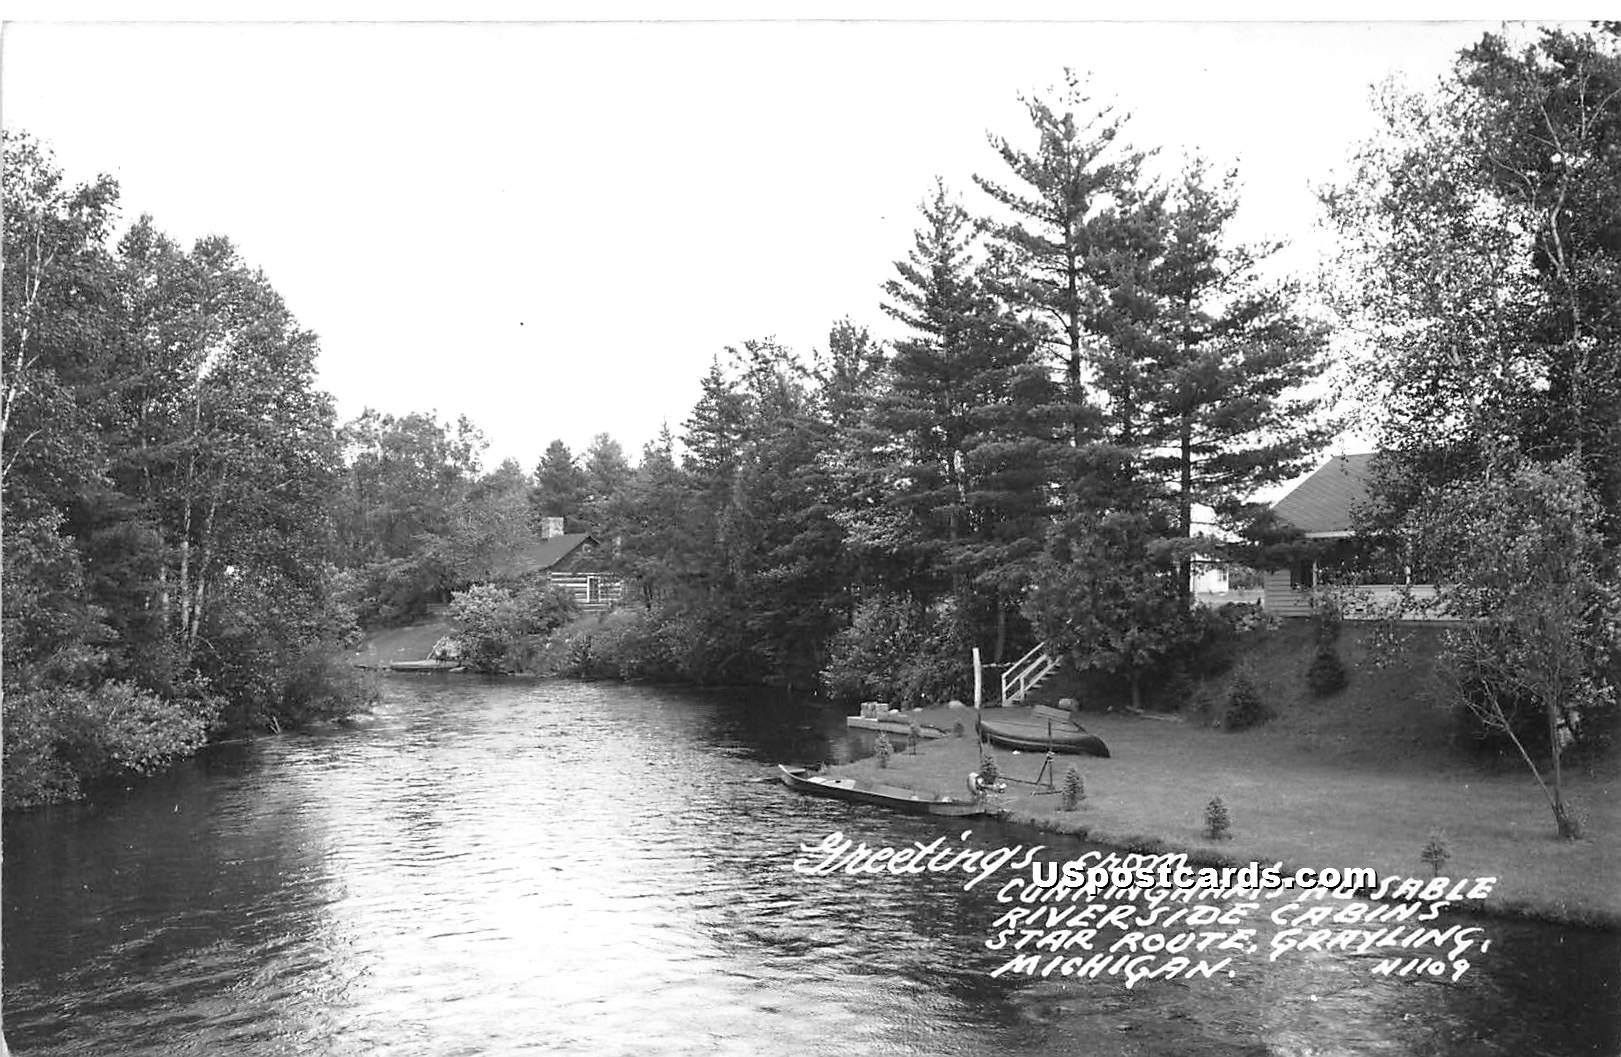 Cunningham's Au Sble Riverside Cabins - Grayling, Michigan MI Postcard